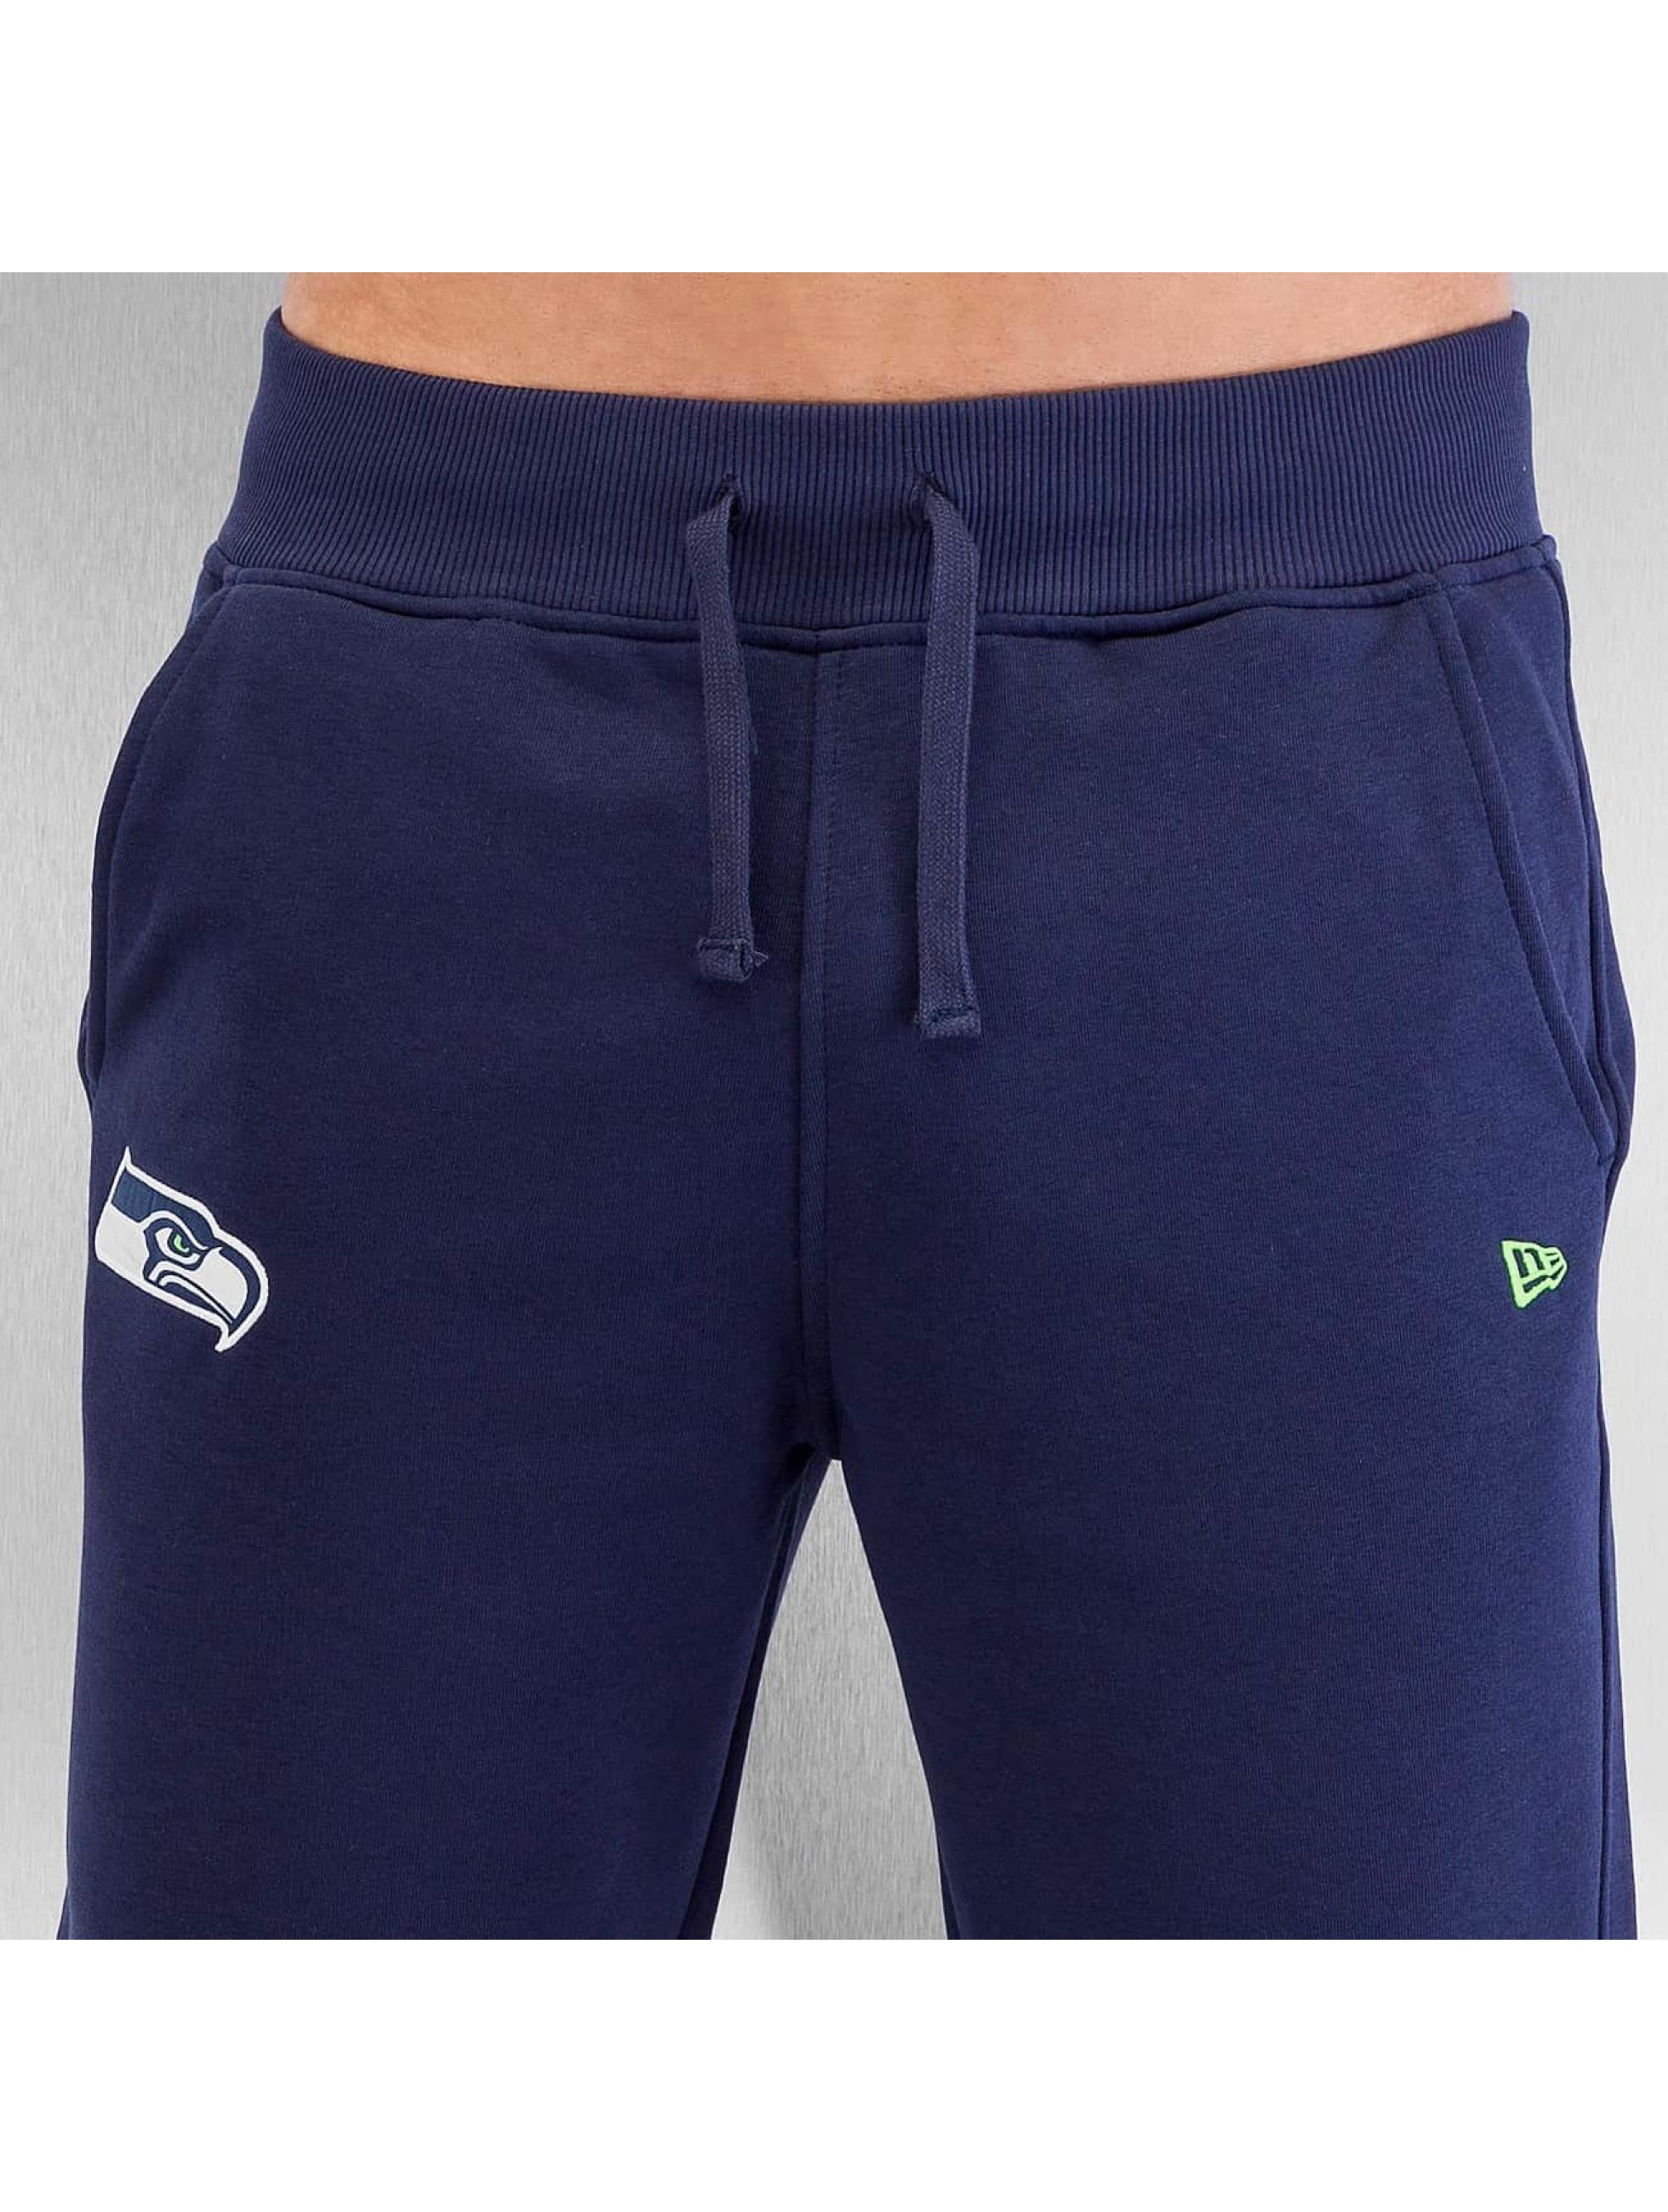 New Era joggingbroek NFL Seattle Seahawks blauw